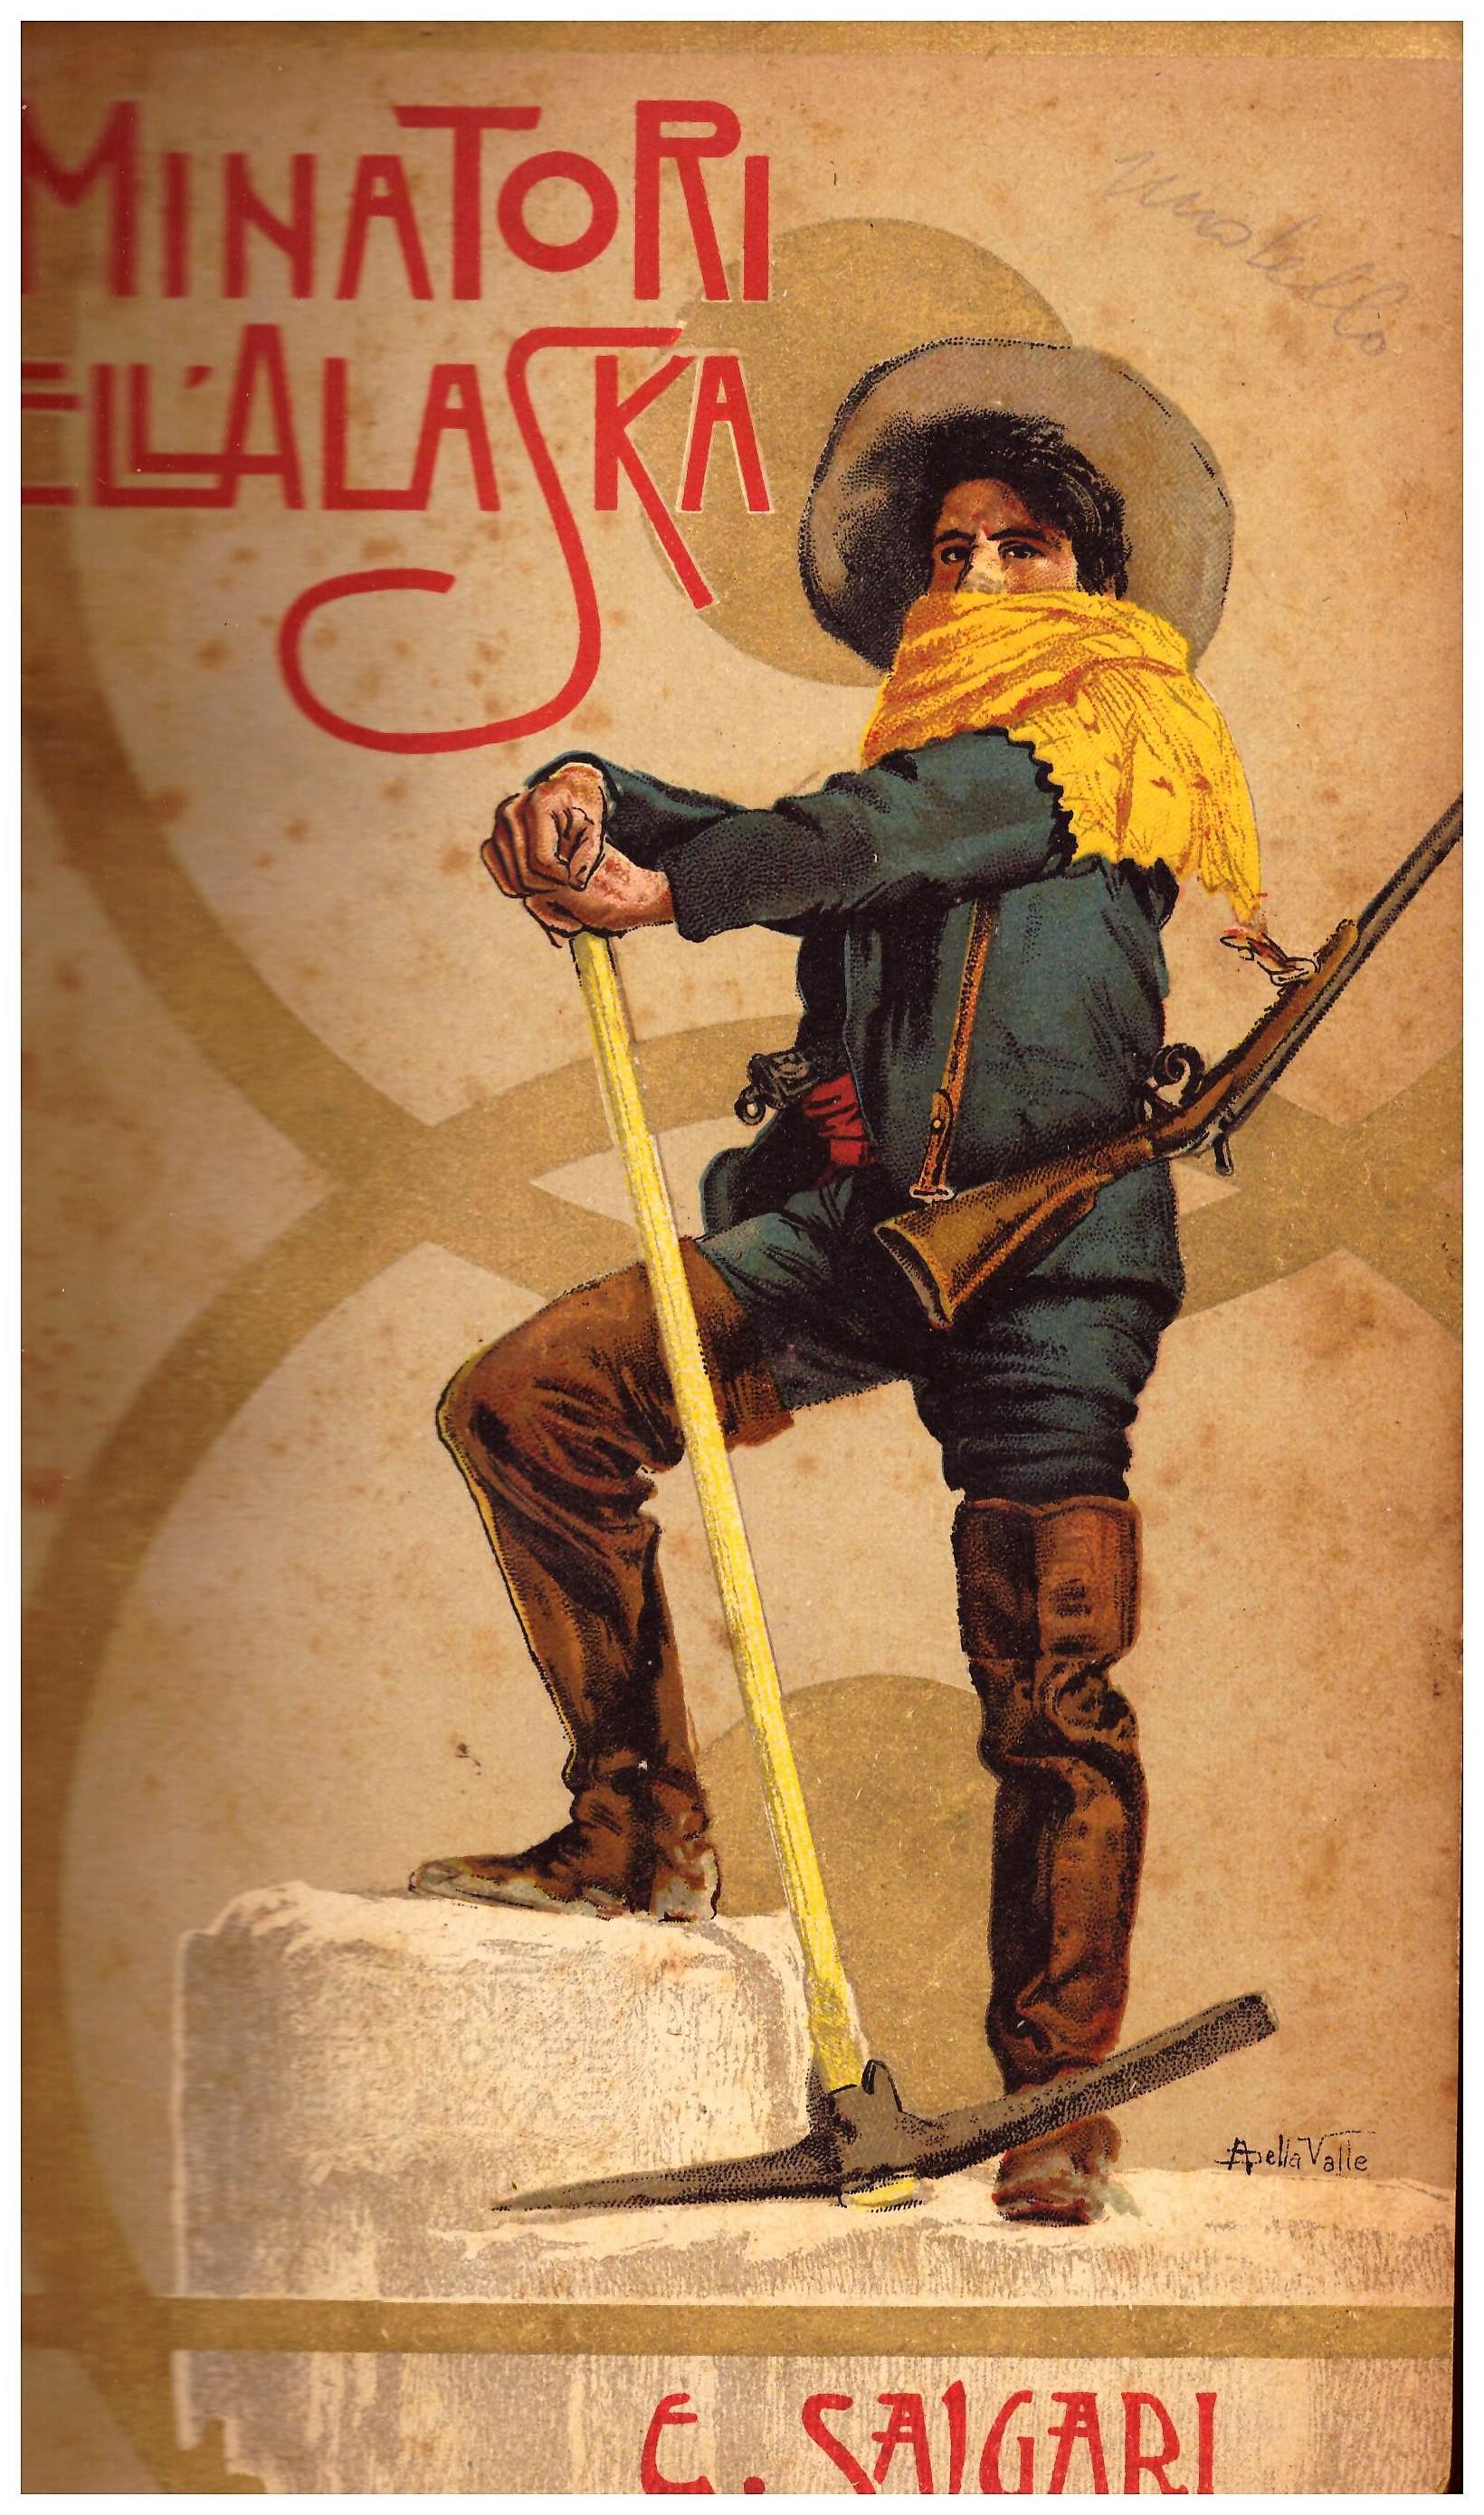 Titolo: I minatori dell'Alaska Autore: Emilio Salgari  Editore: Antonio Vallardi, Milano 1928